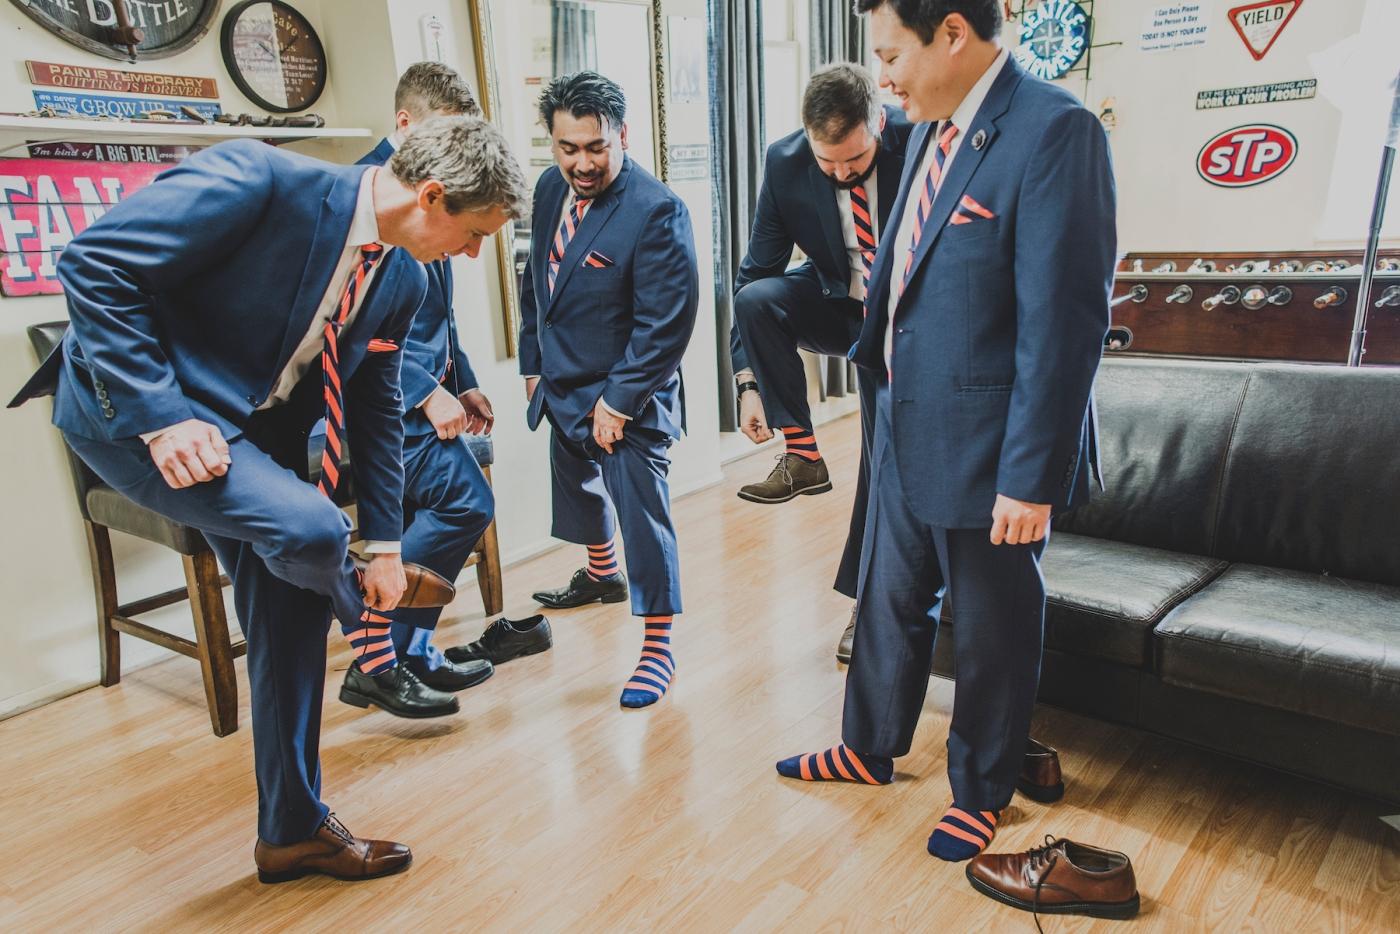 DSC_1903Everett_Wedding_Ballroom_Jane_Speleers_photography_Rachel_and_Edmund_Getting_ready_2017